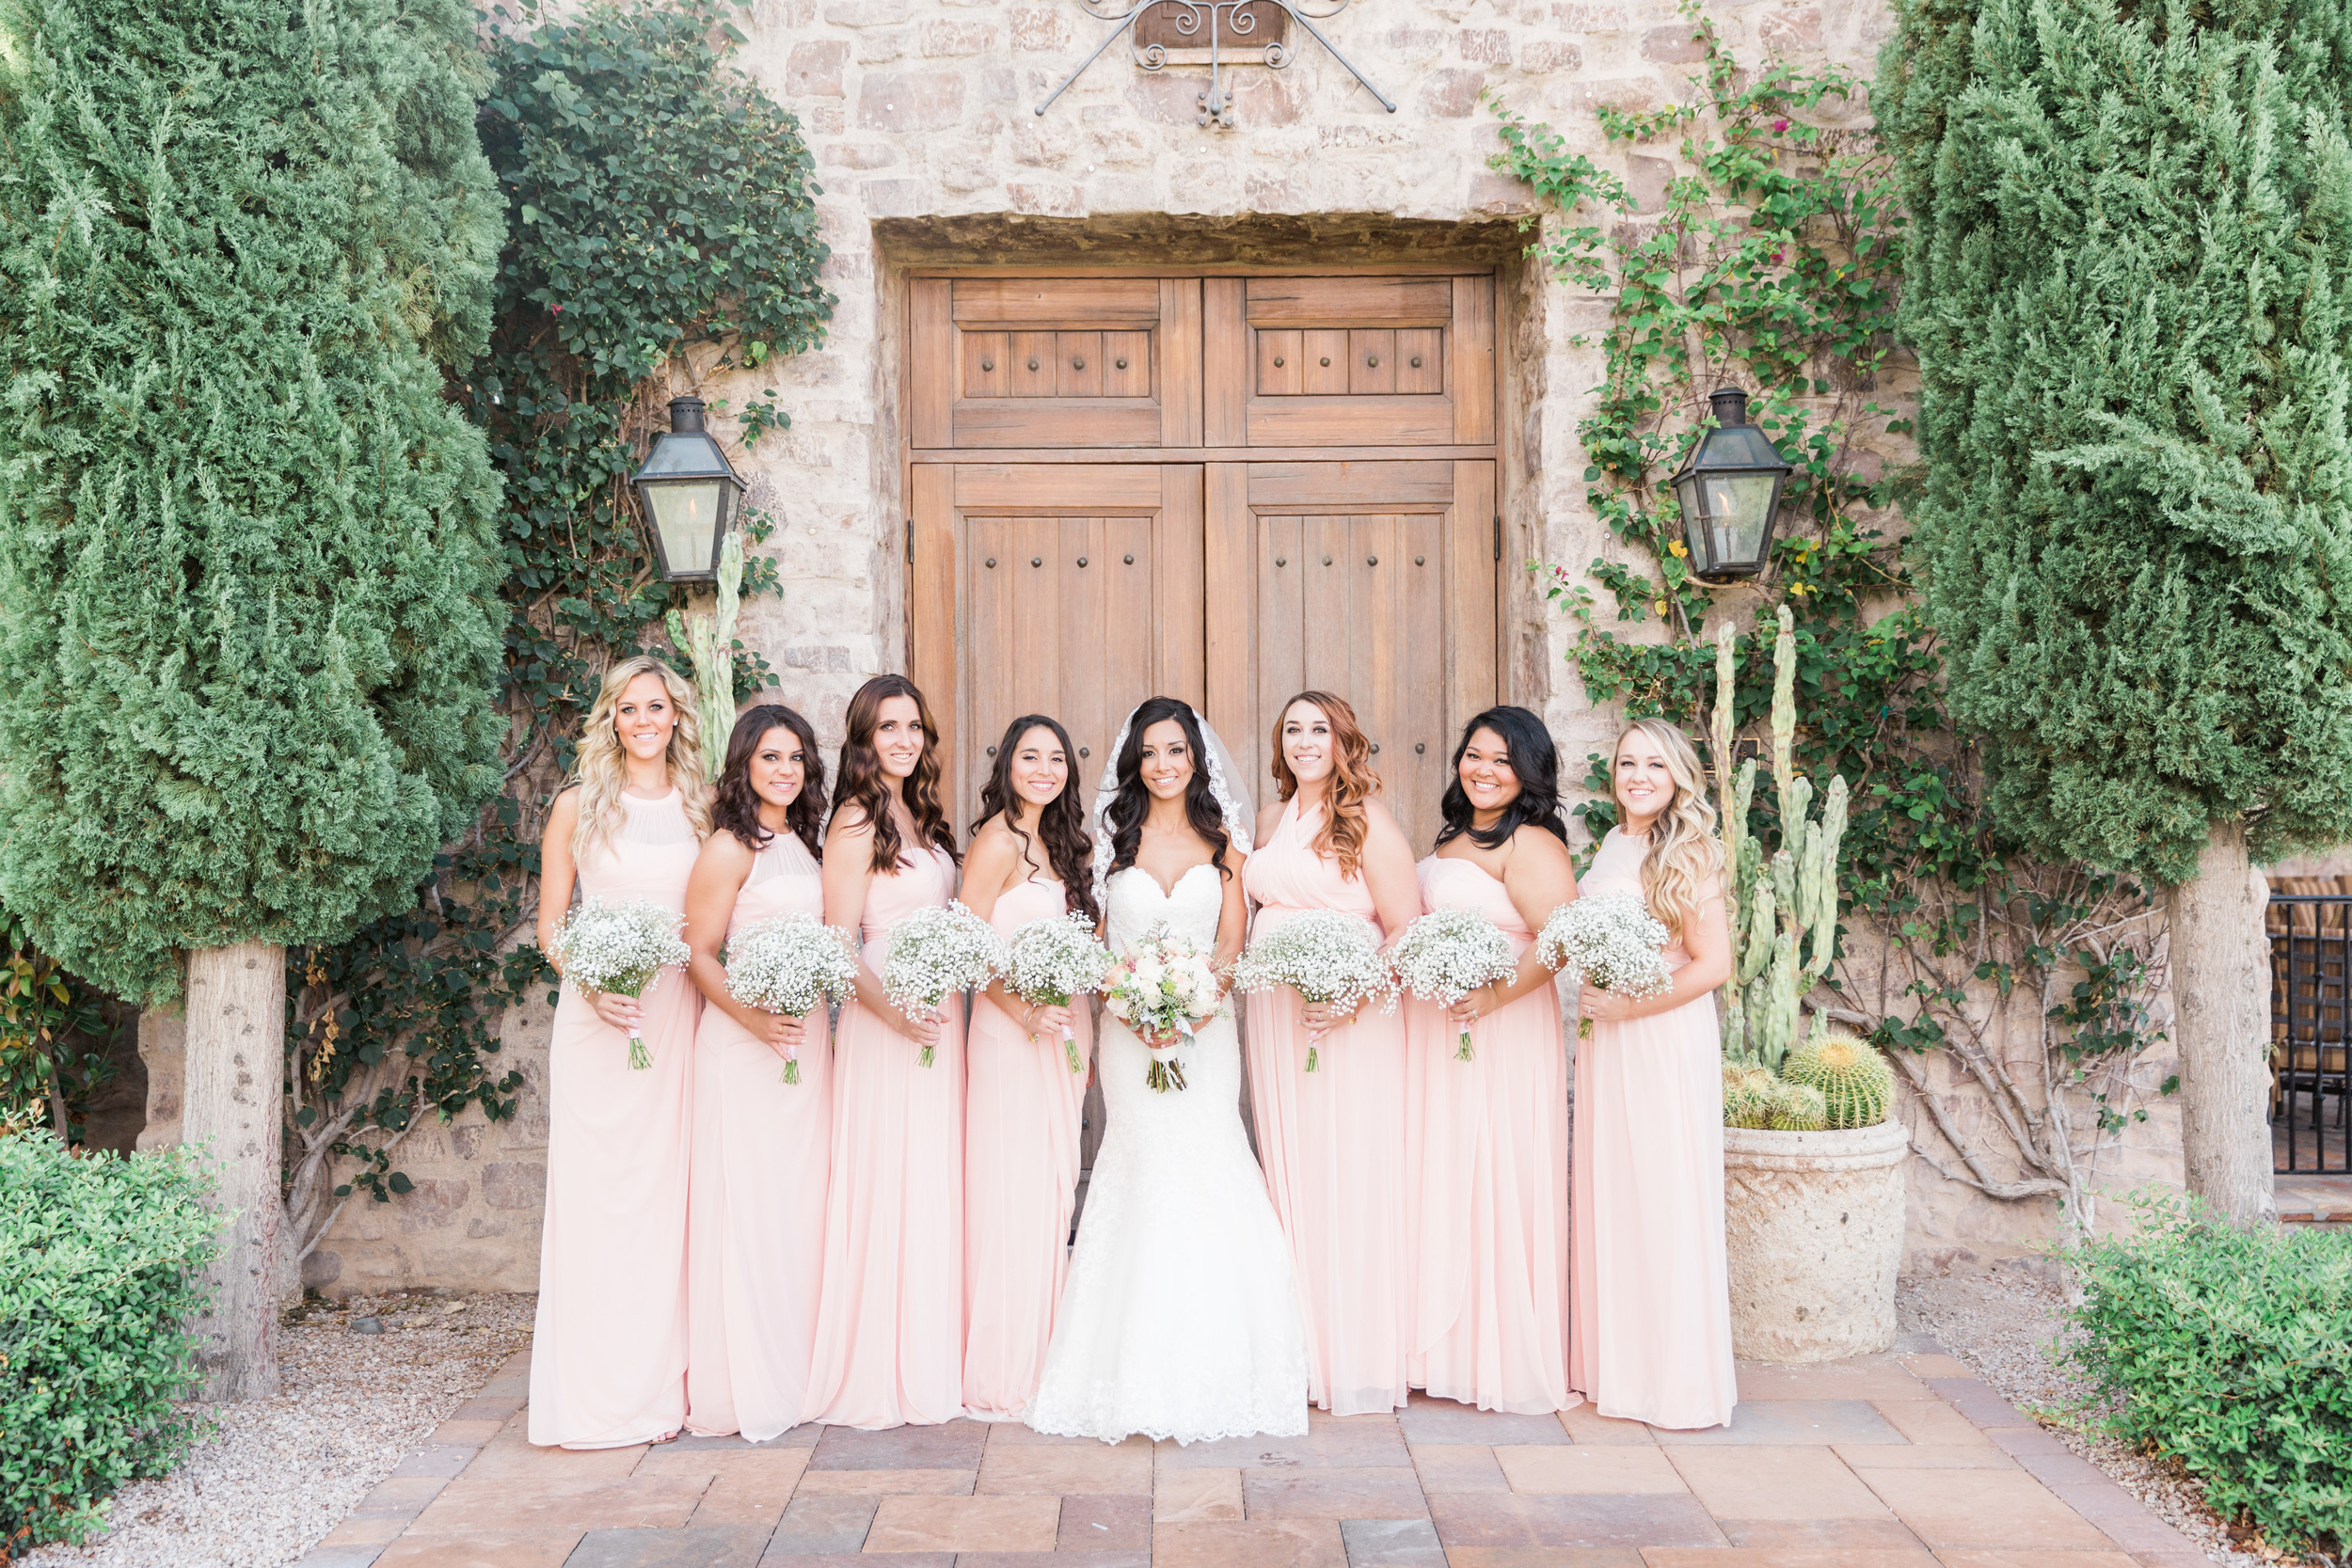 Bridesmaids in Blush |Superstition Mountain Golf Club Wedding | Phoenix Wedding Photographers | See more at BetsyandJohn.com